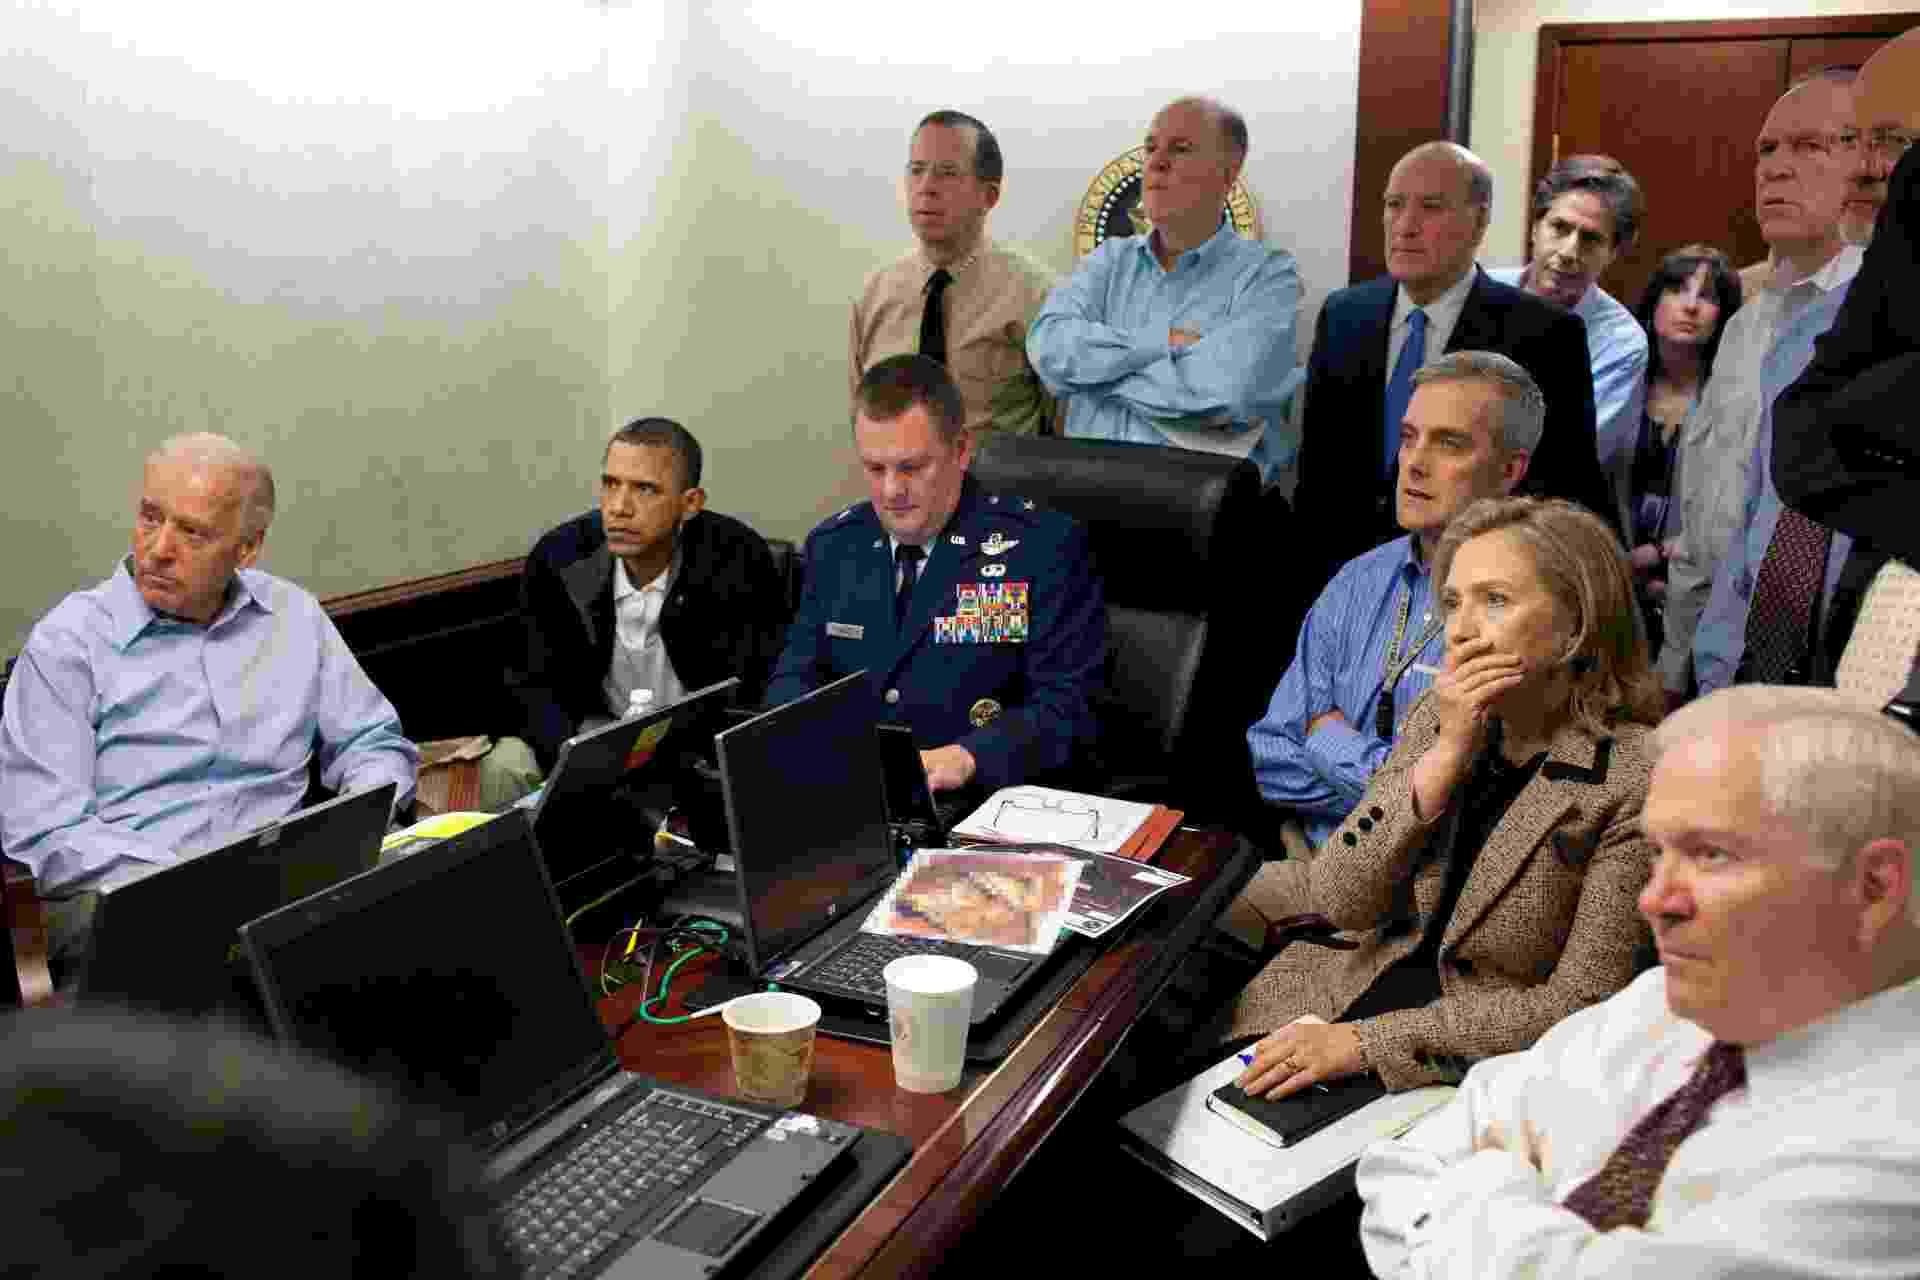 Presidente dos EUA acompanha invasão do esconderijo de Osama Bin Laden - Pete Souza/White House